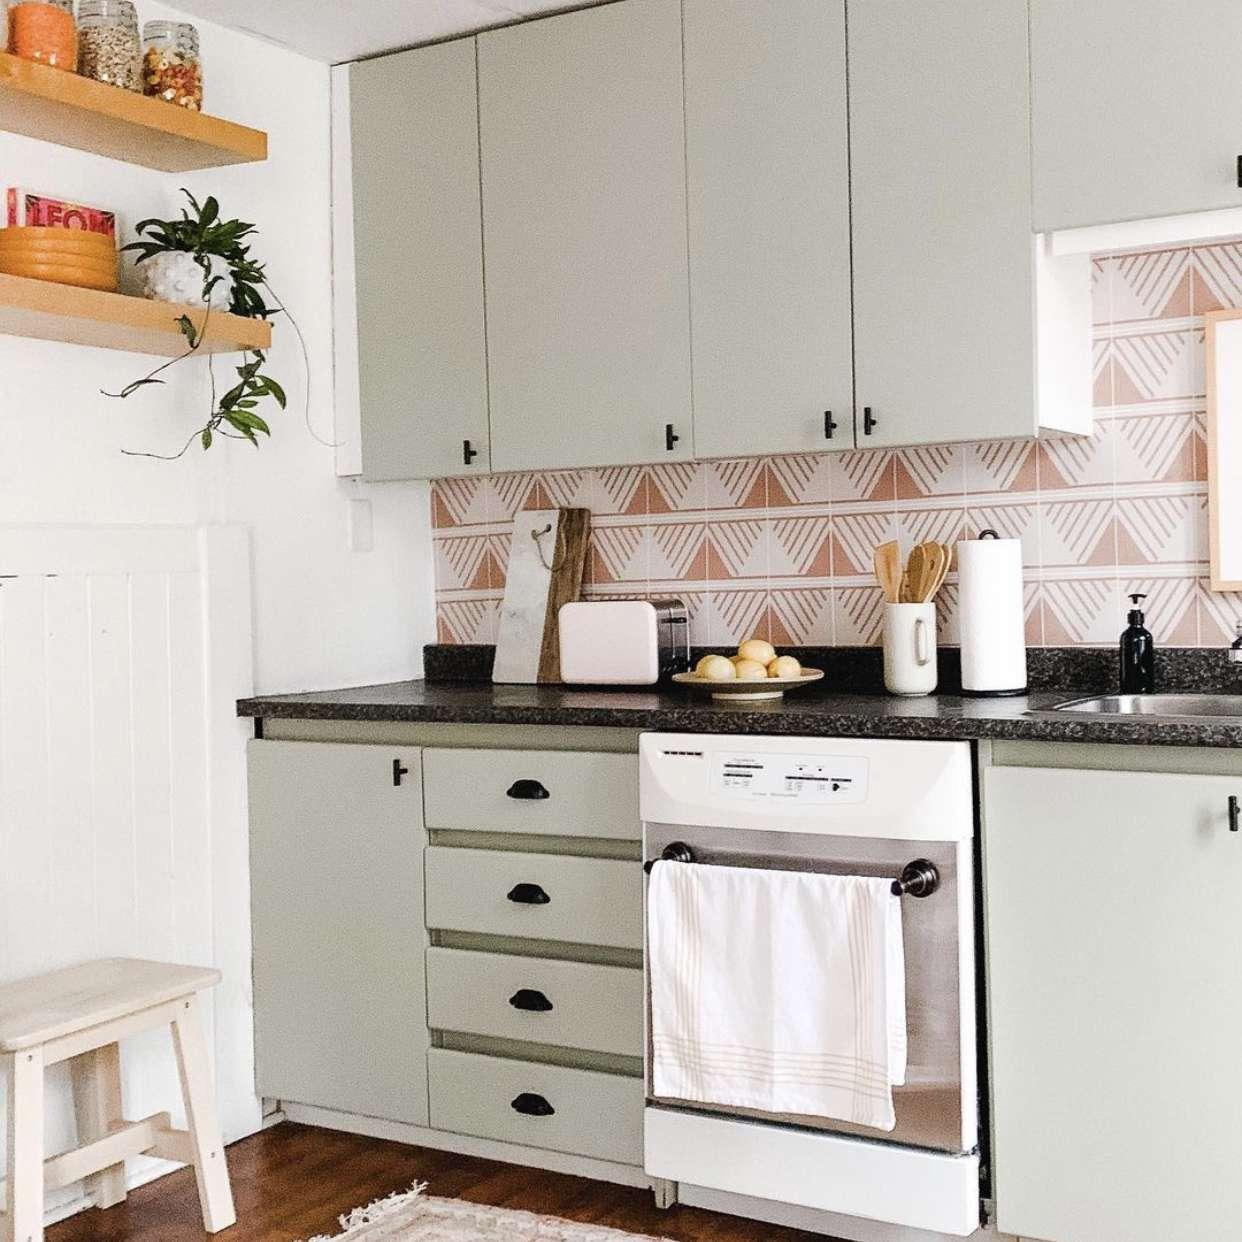 Sage green kitchen cabinets with pink backsplash.